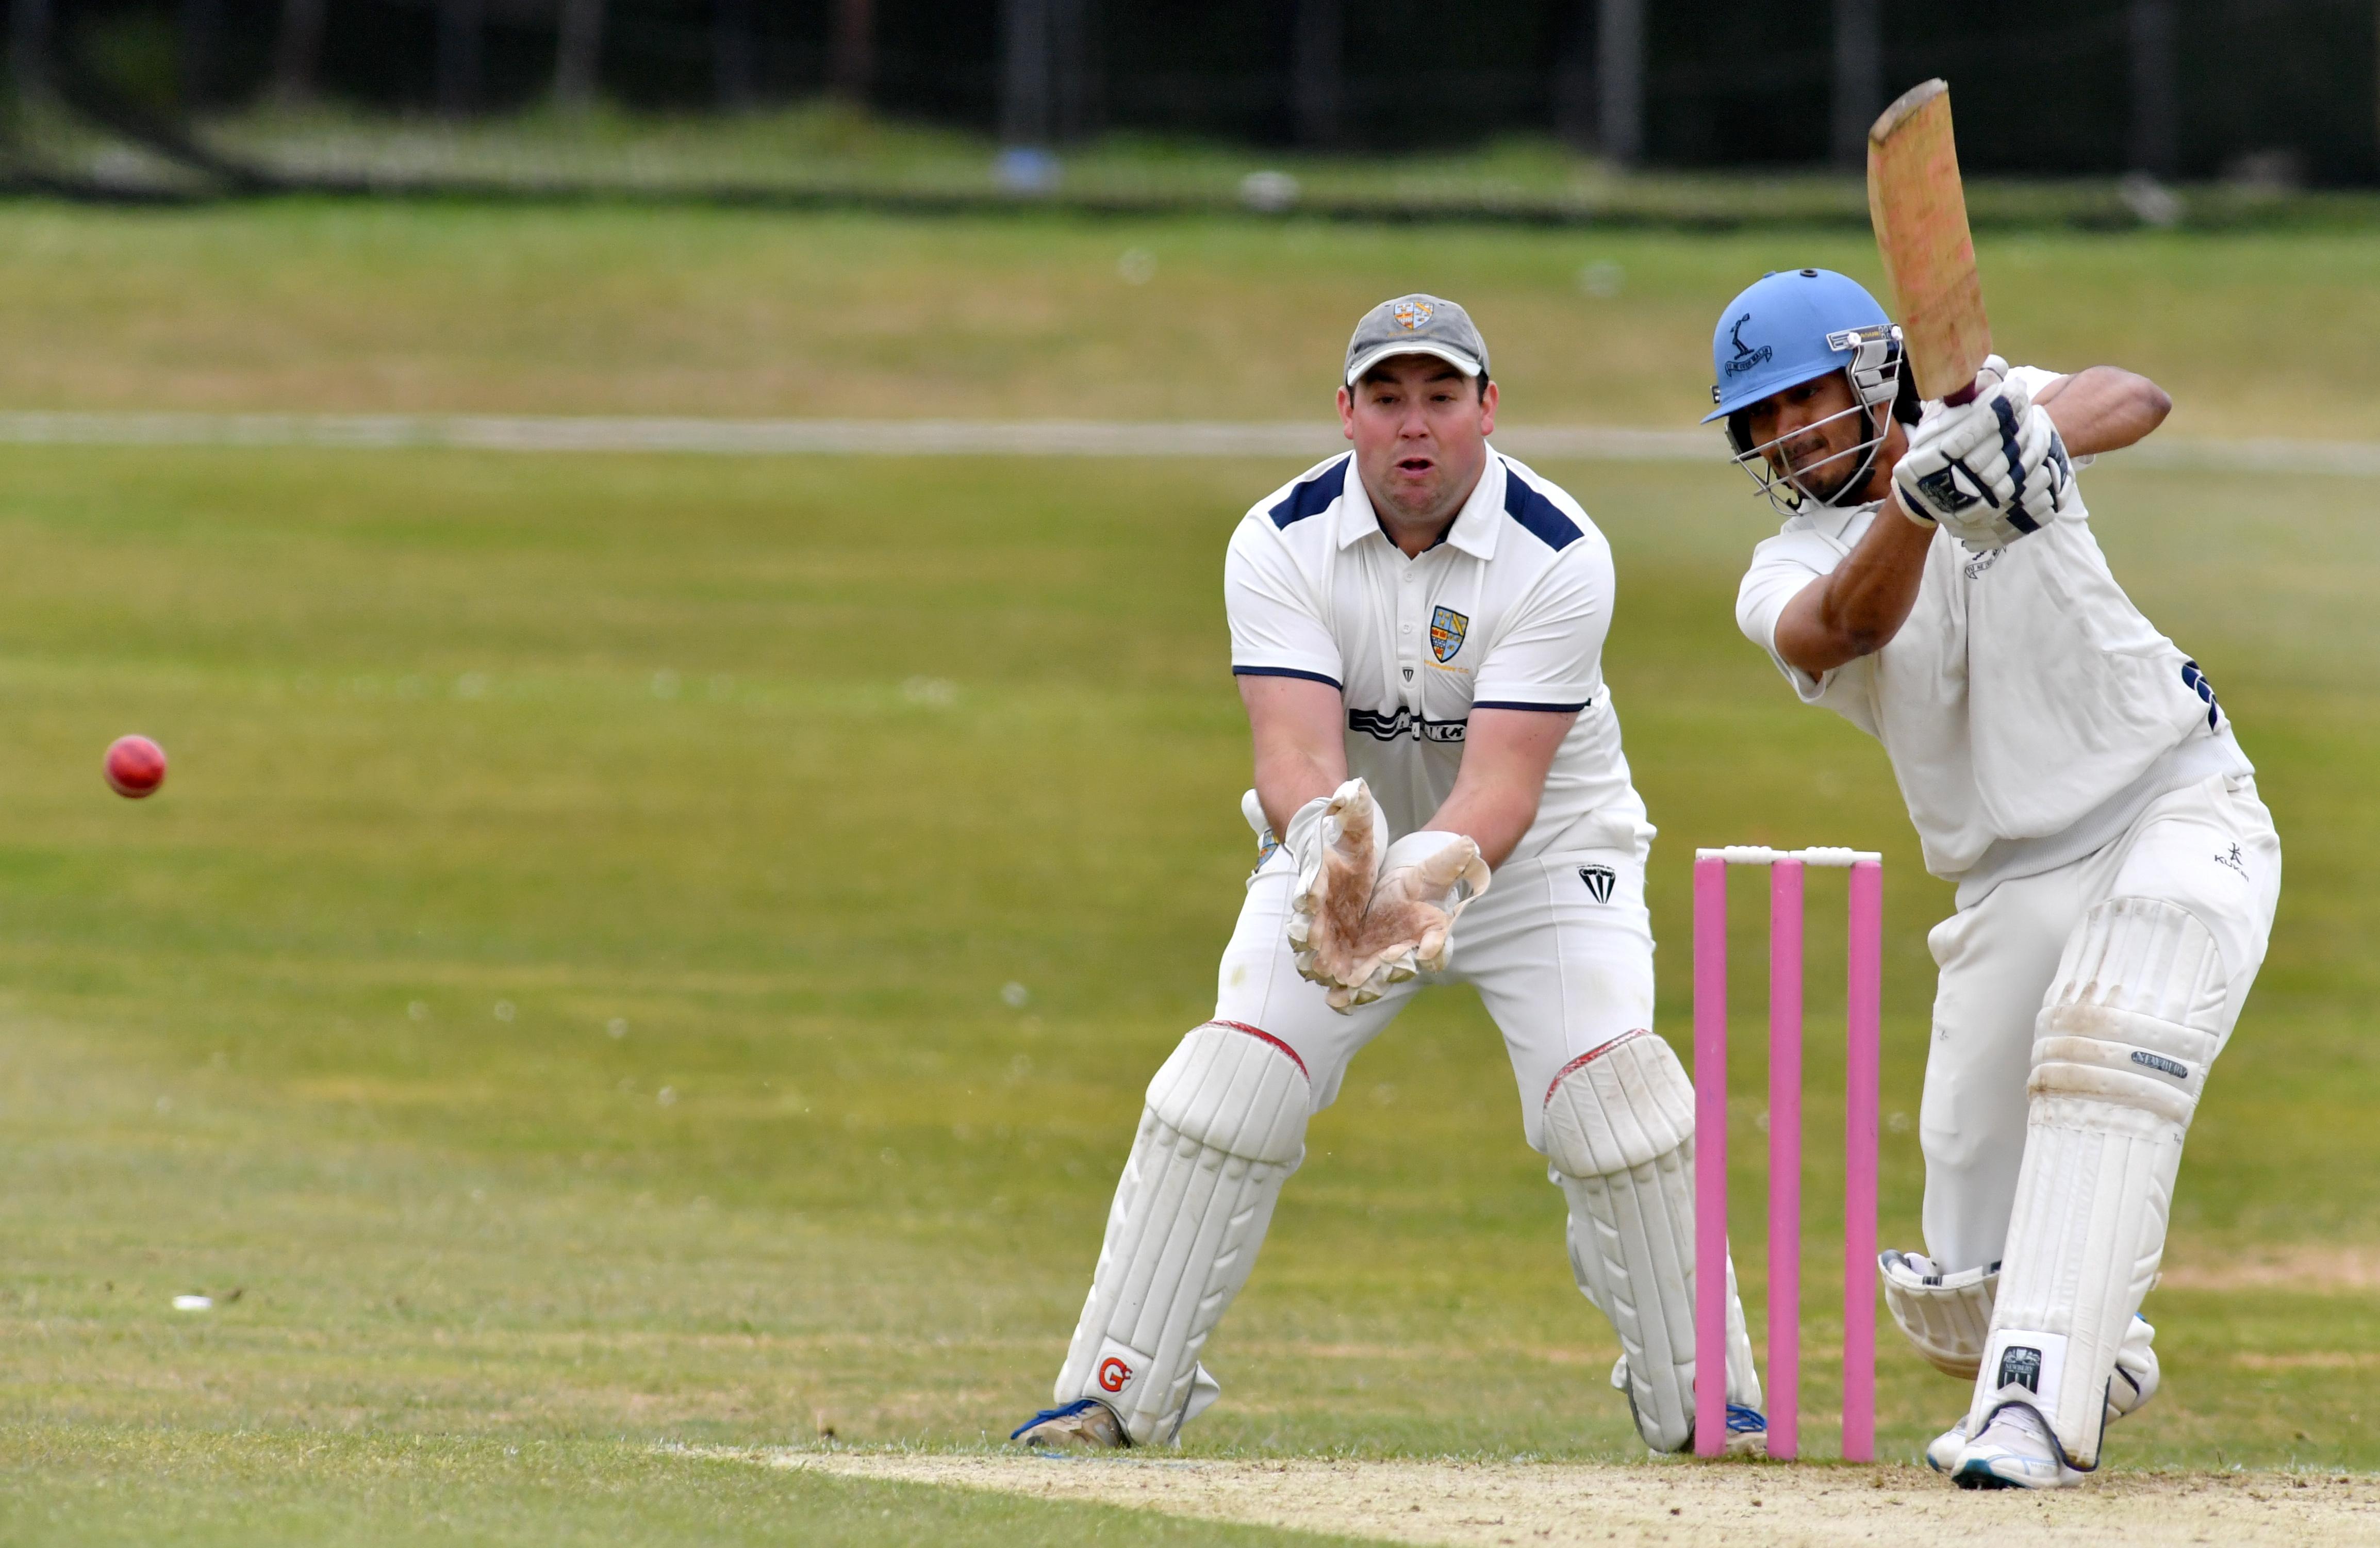 Aberdeenshire's wicket keeper Kenny Reid and Carlton batsman Arun Pillai.  Picture by Kami Thomson